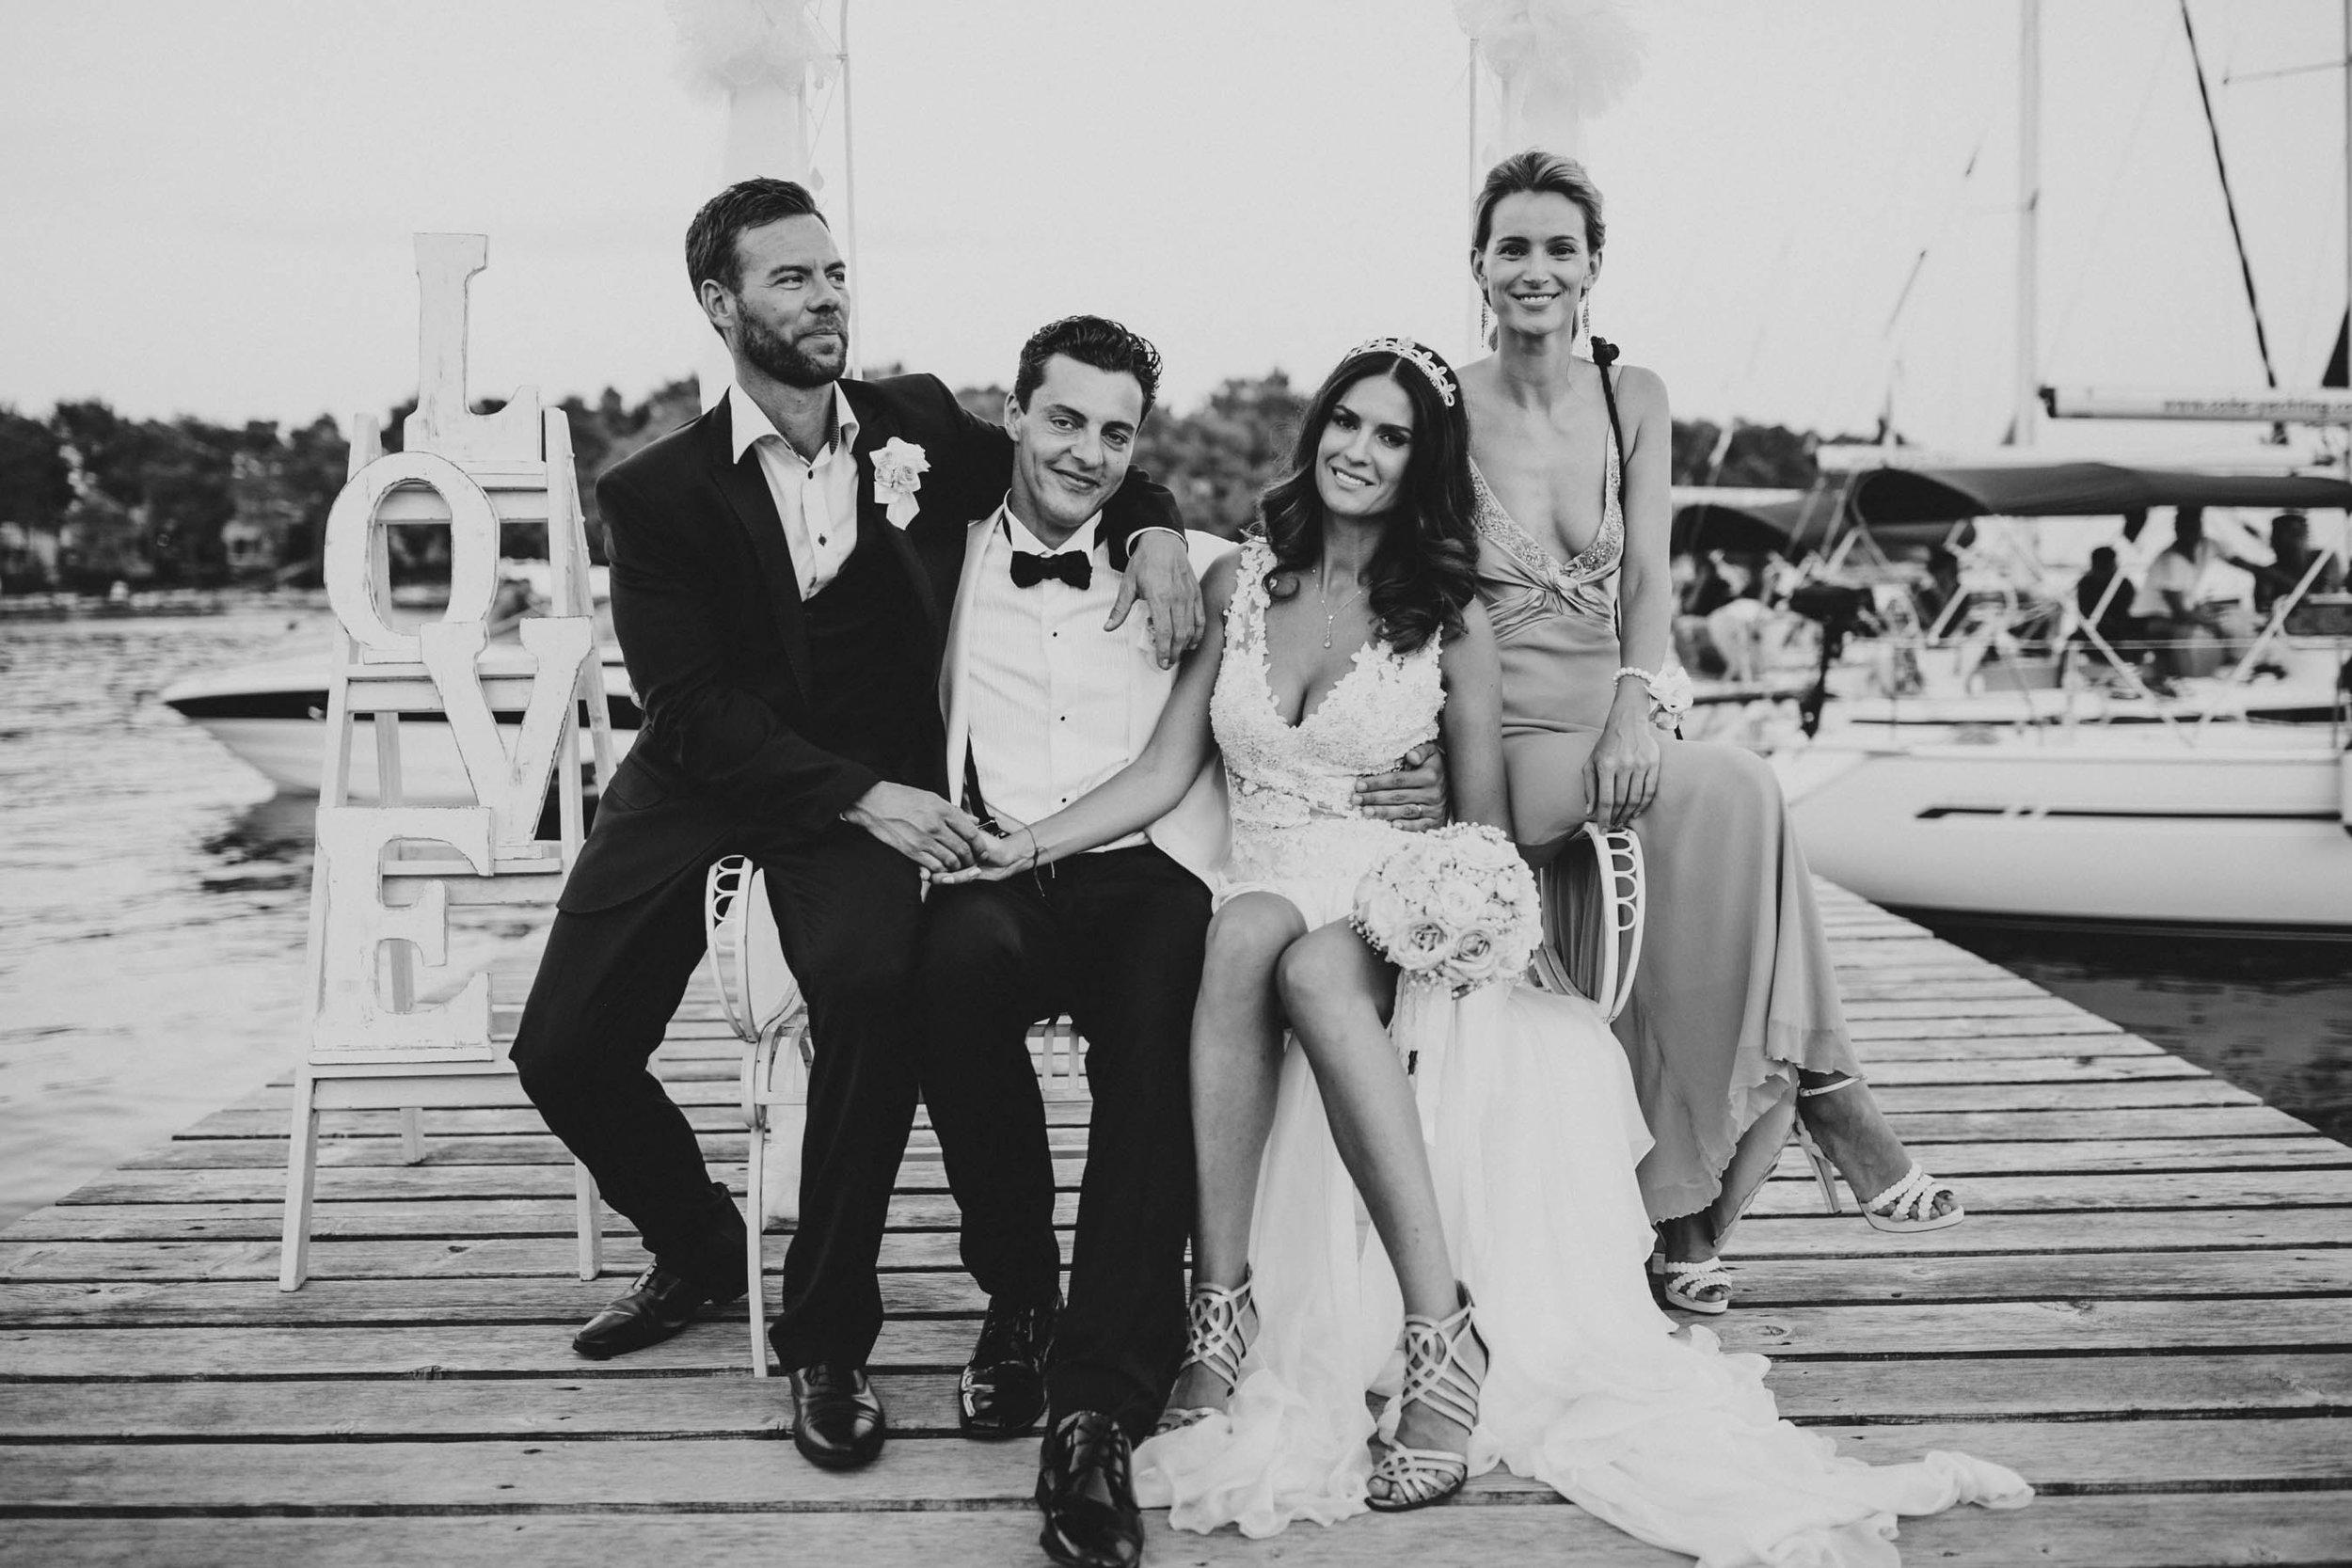 sylvia&dimitri-Wedding-Crvena_Luka-Croatia-77(8843).jpg